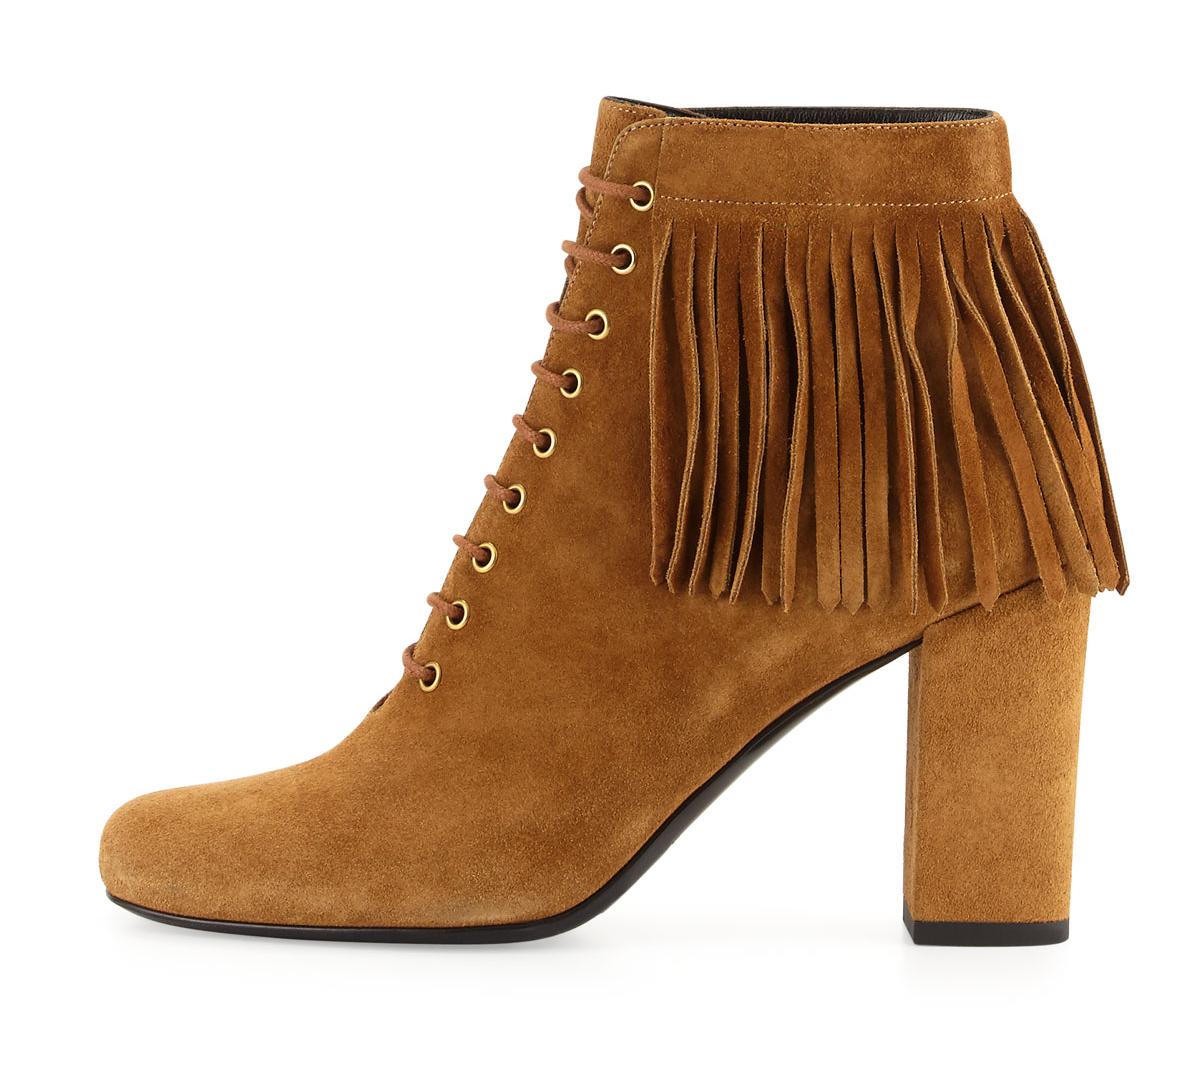 saint-laurent-fringed-suede-lace-up-boot